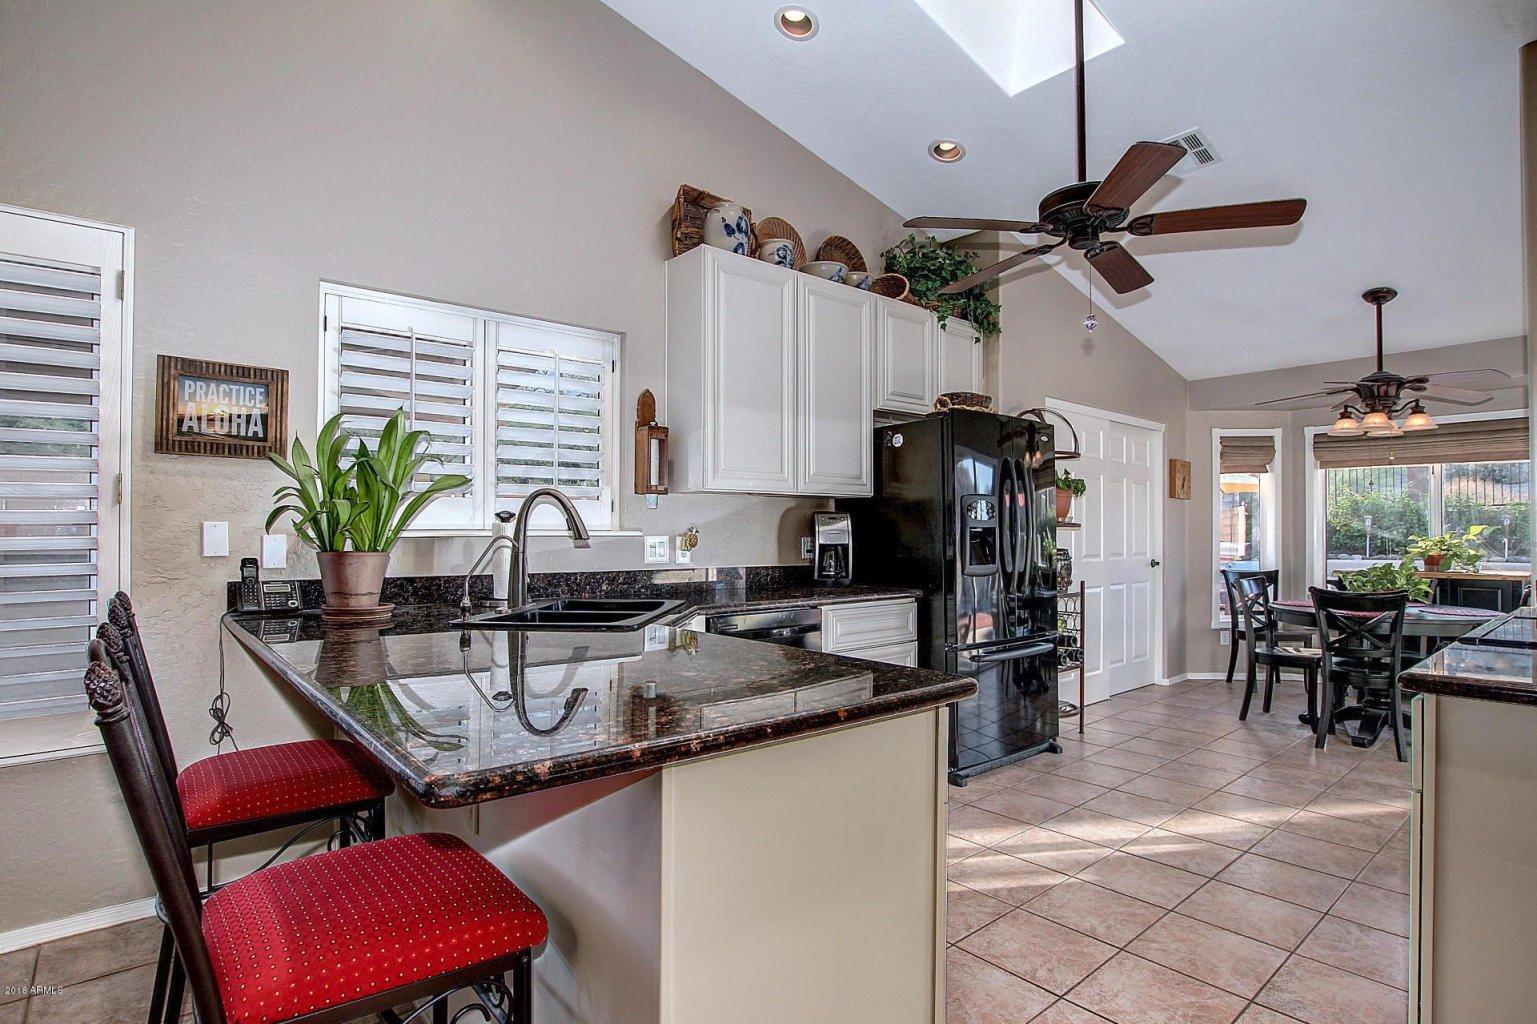 Photo 11: Photos: 3602 E Mountain Sky Avenue in Phoenix: Ahwatukee House for sale : MLS®# 5462780